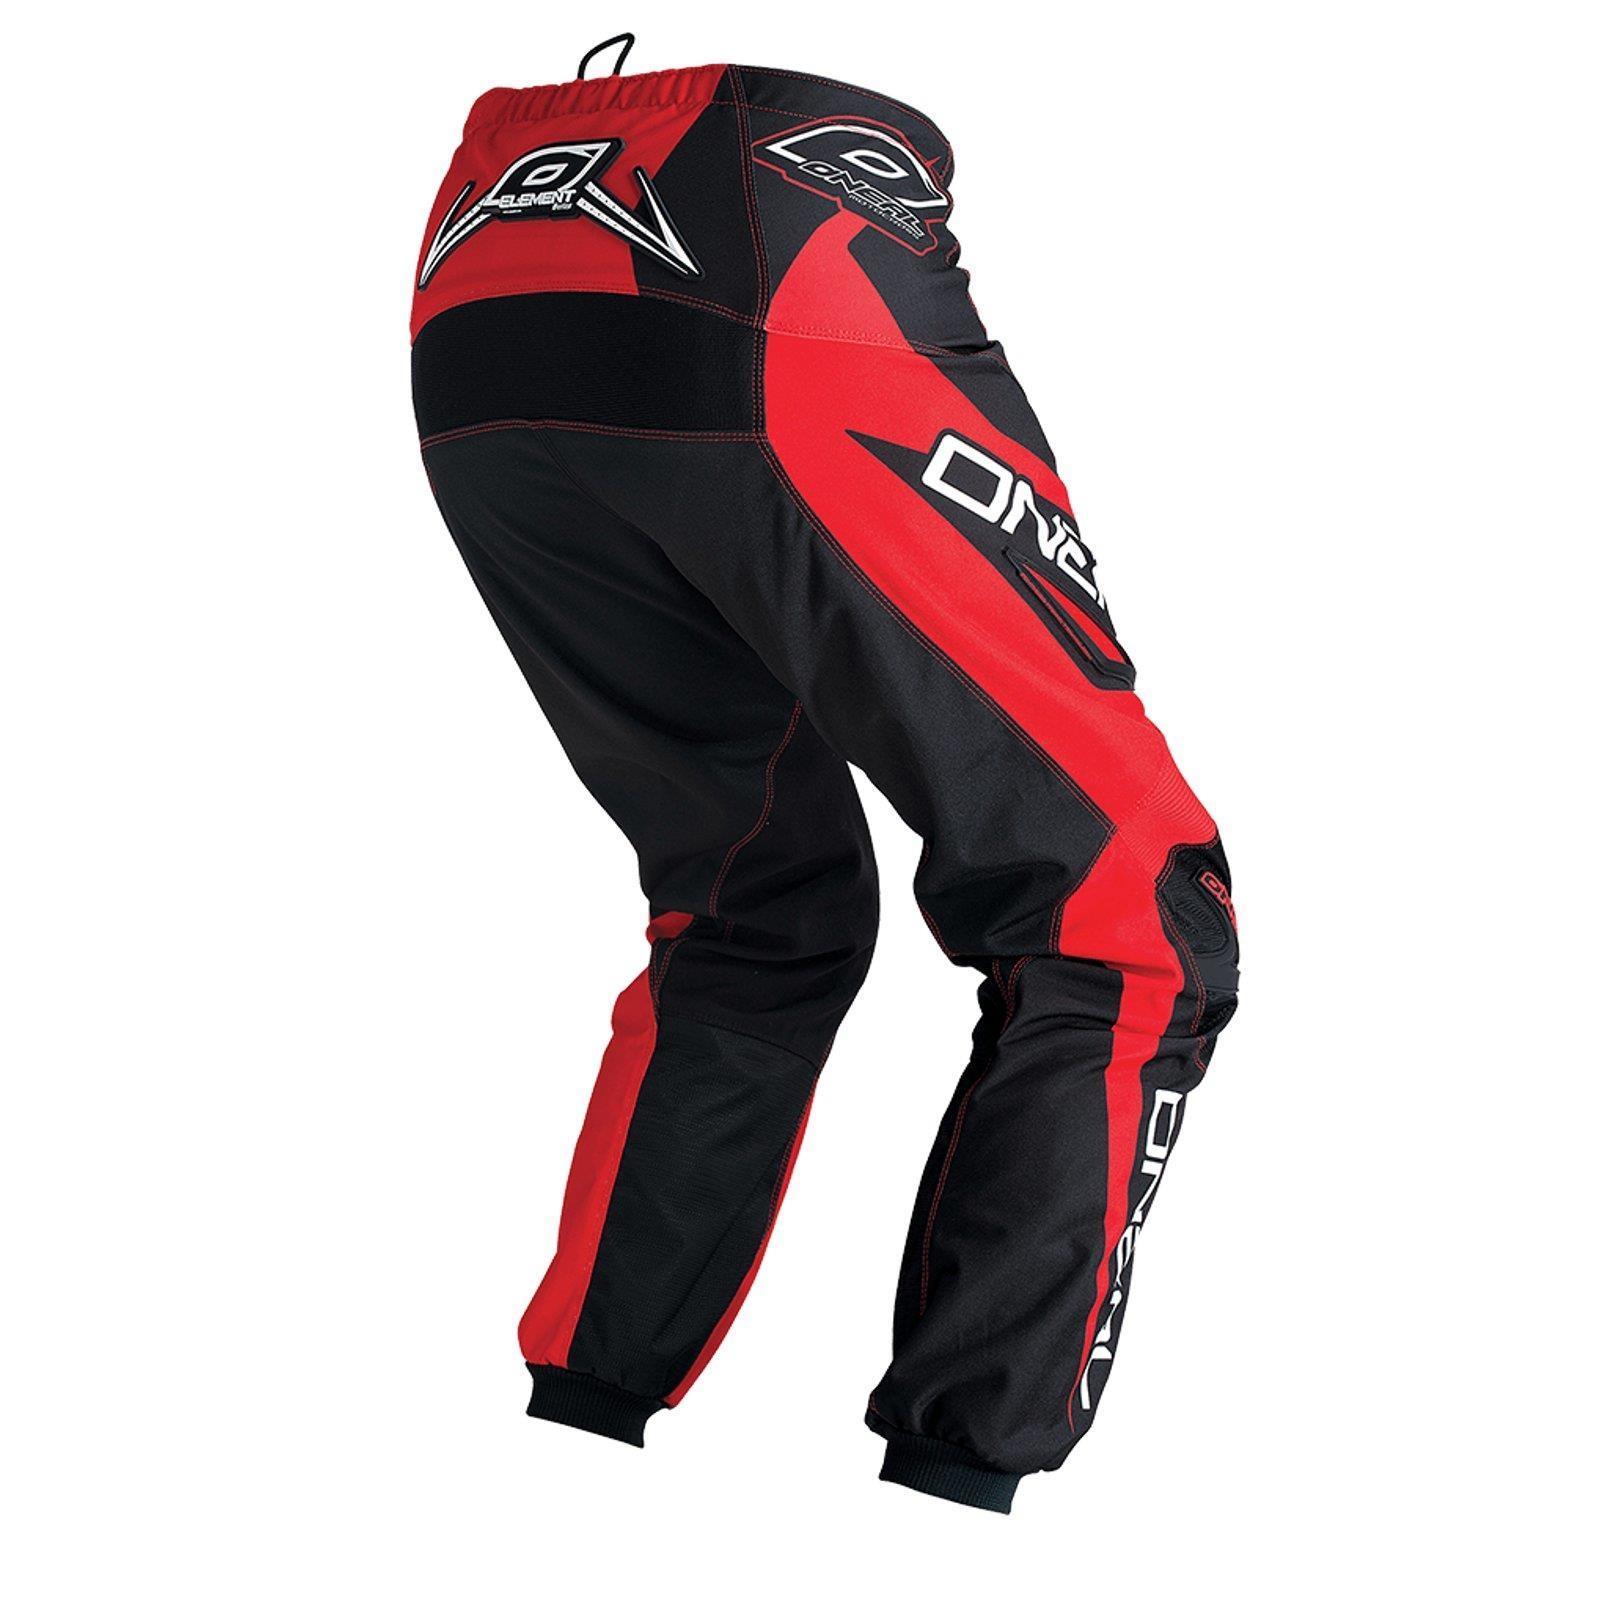 O-039-neal-elemento-Mayhem-Hardwear-Pants-pantalones-MX-Moto-Cross-Enduro-todoterreno-cuero miniatura 16